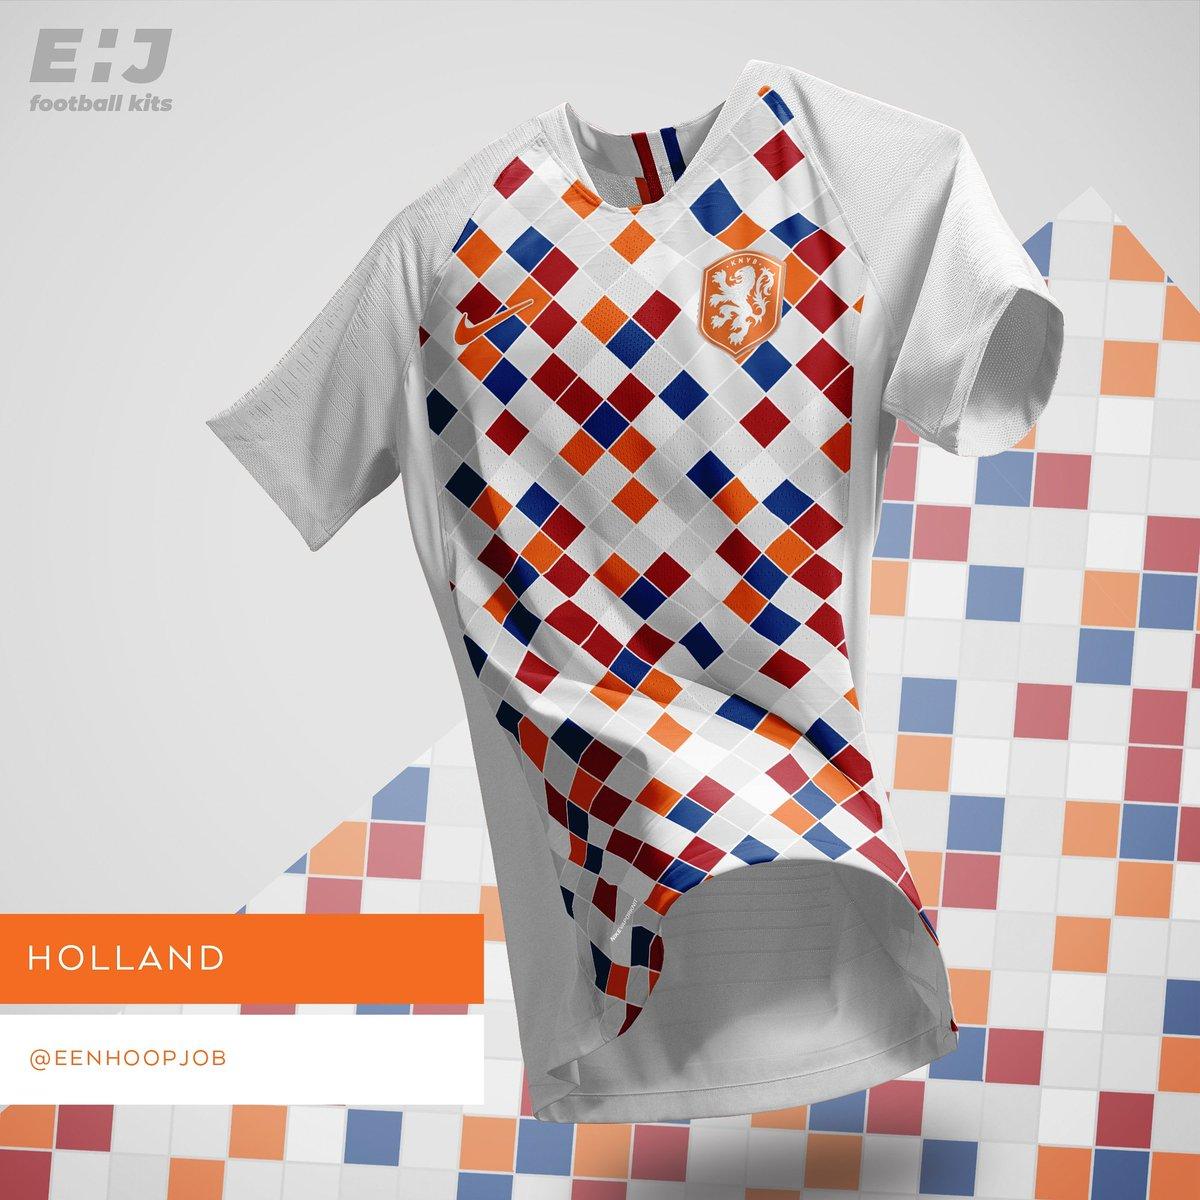 0602fa394 Job - Eenhoopjob Football Kit Designs on Twitter